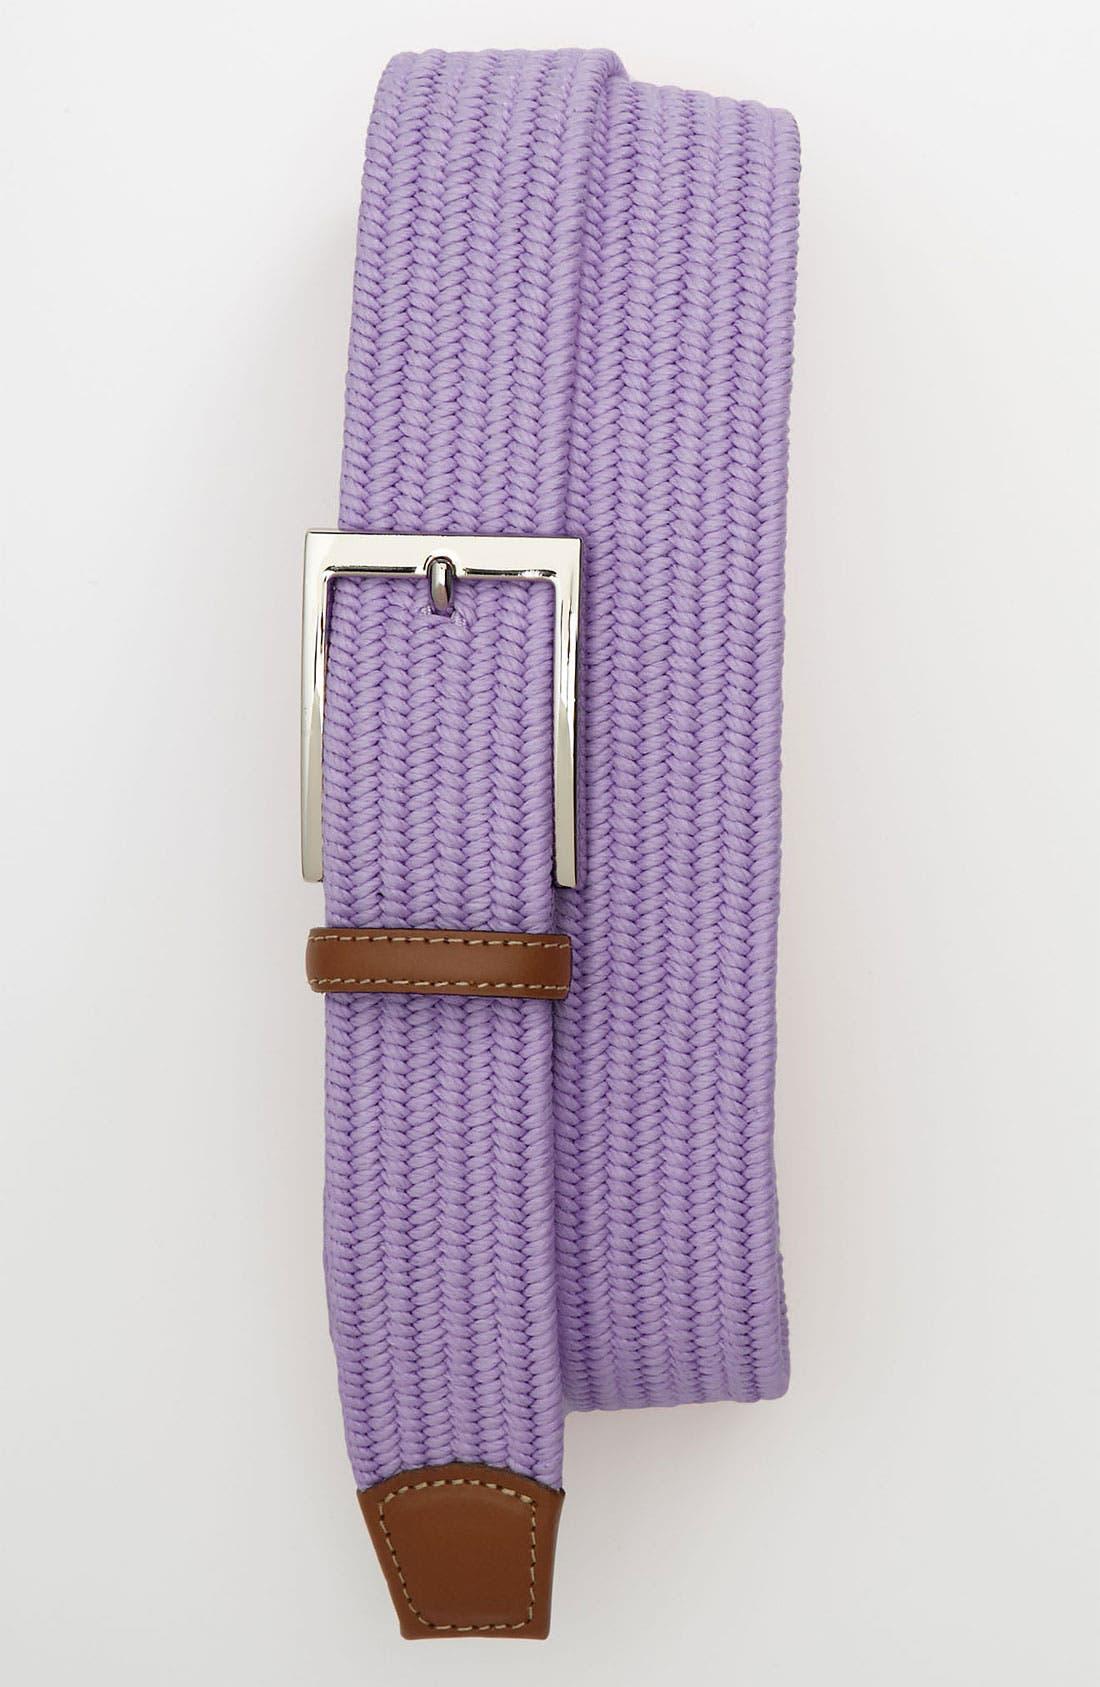 Alternate Image 1 Selected - Torino Belts Cotton Belt